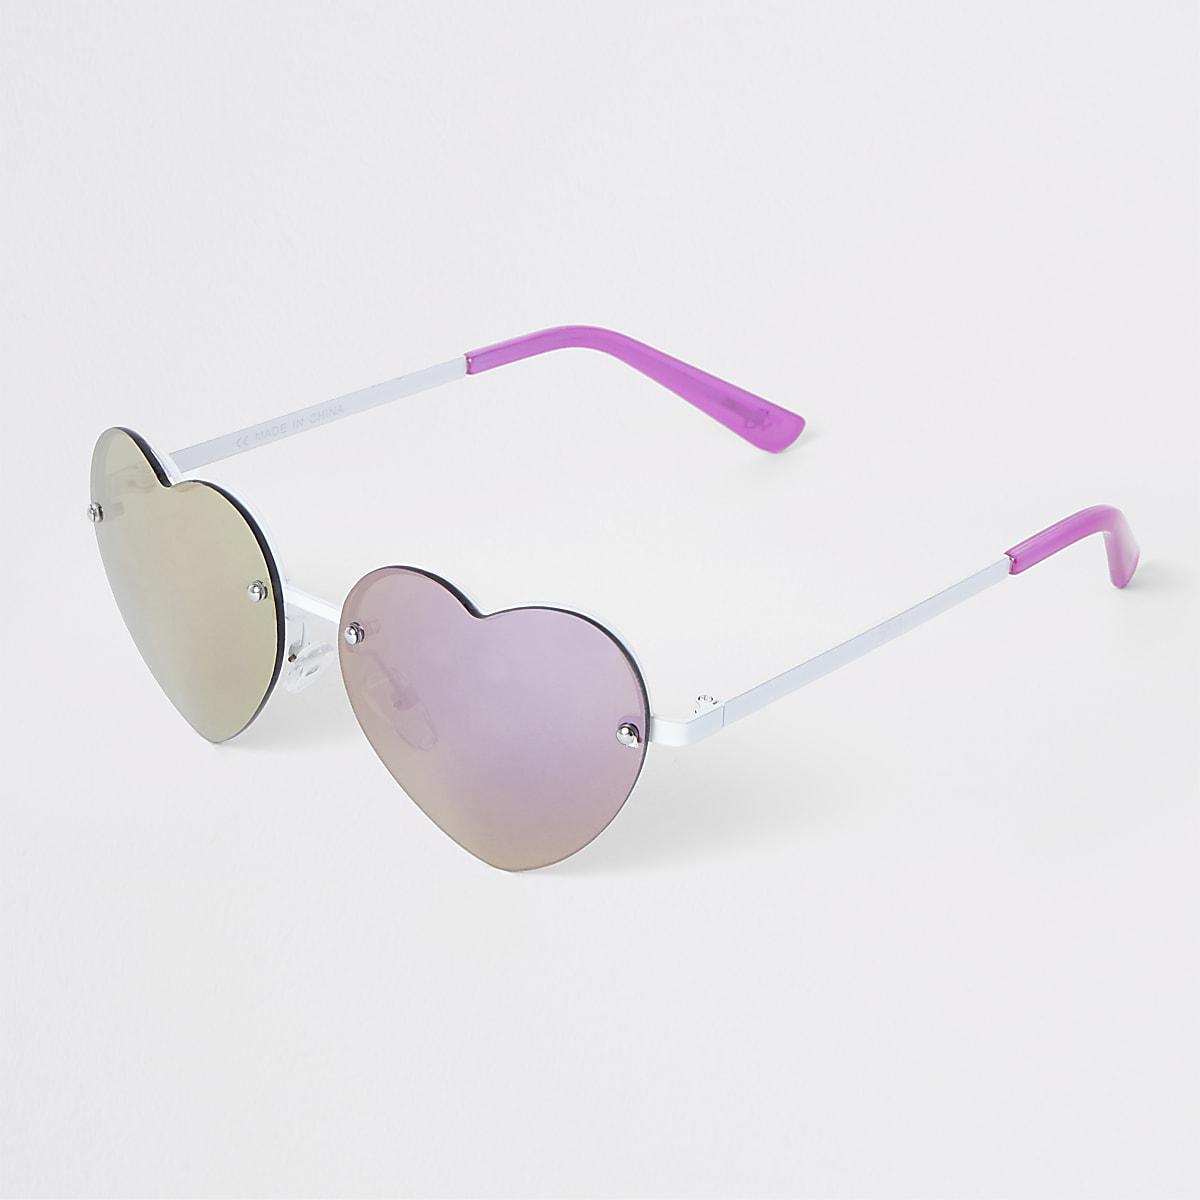 b3bc2b99f339 Girls pink heart sunglasses - Sunglasses - Accessories - girls